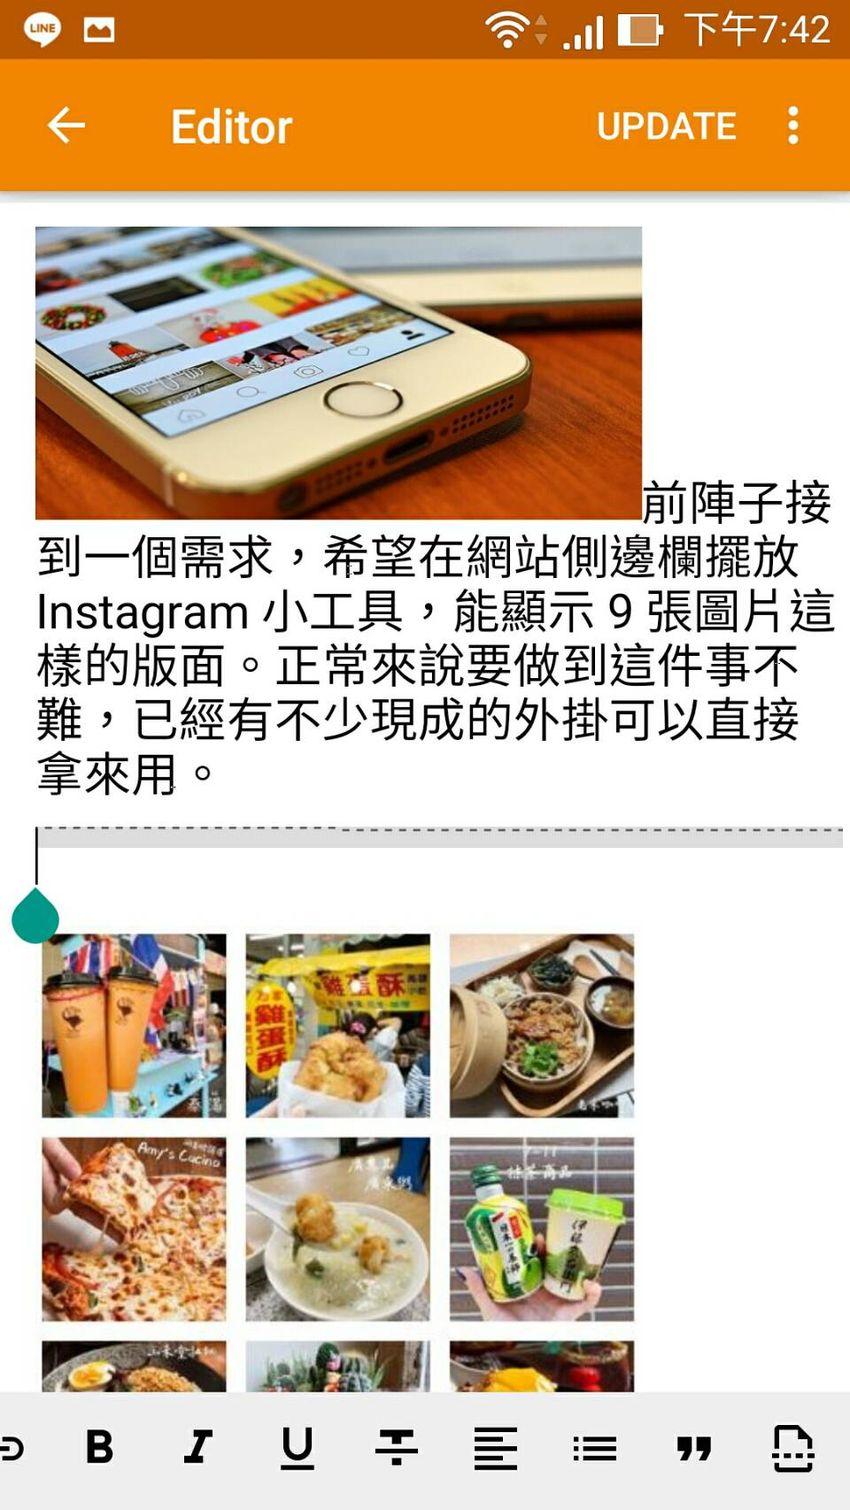 blogger-android-app-publish-post-3.jpg-Blogger 可以在行動裝置發佈文章+上傳圖片的 APP 整理